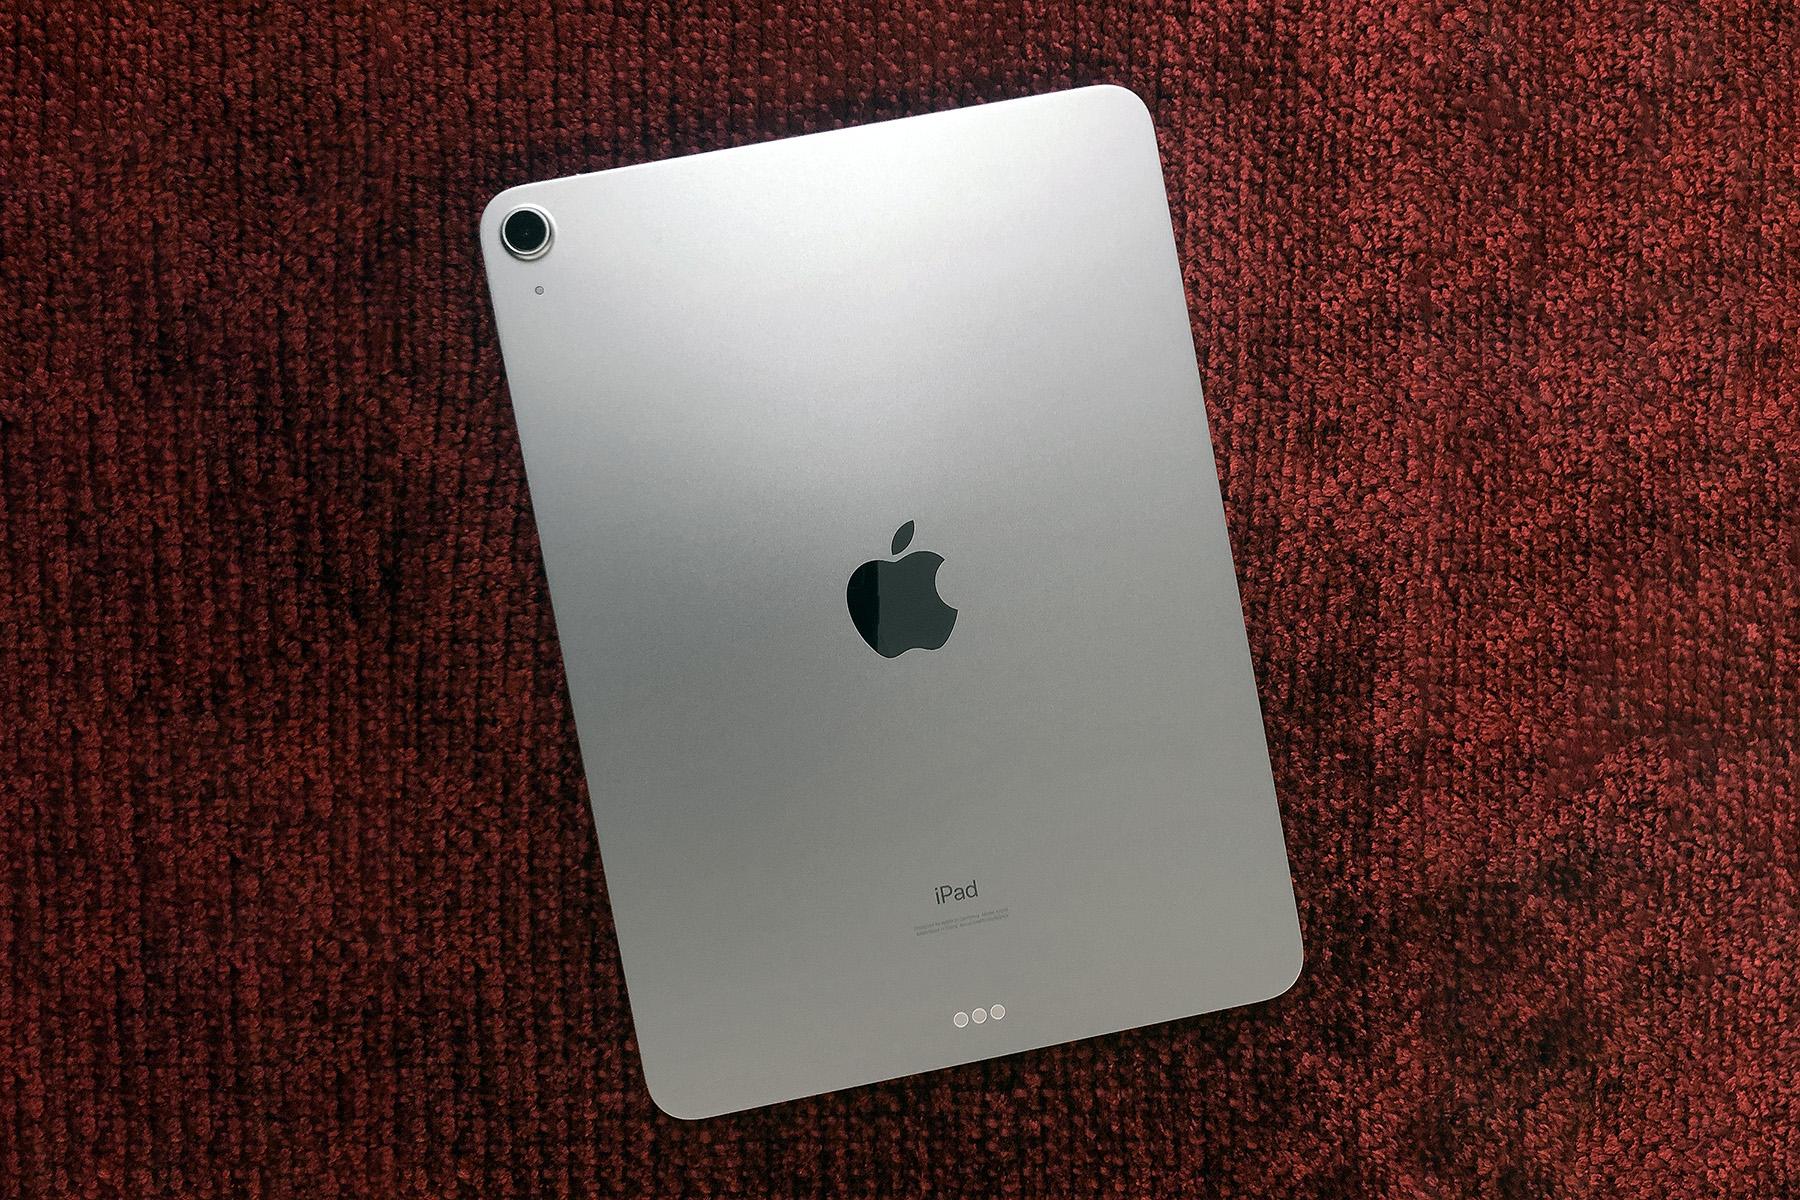 A rear view of Apple's 2020 iPad Air.